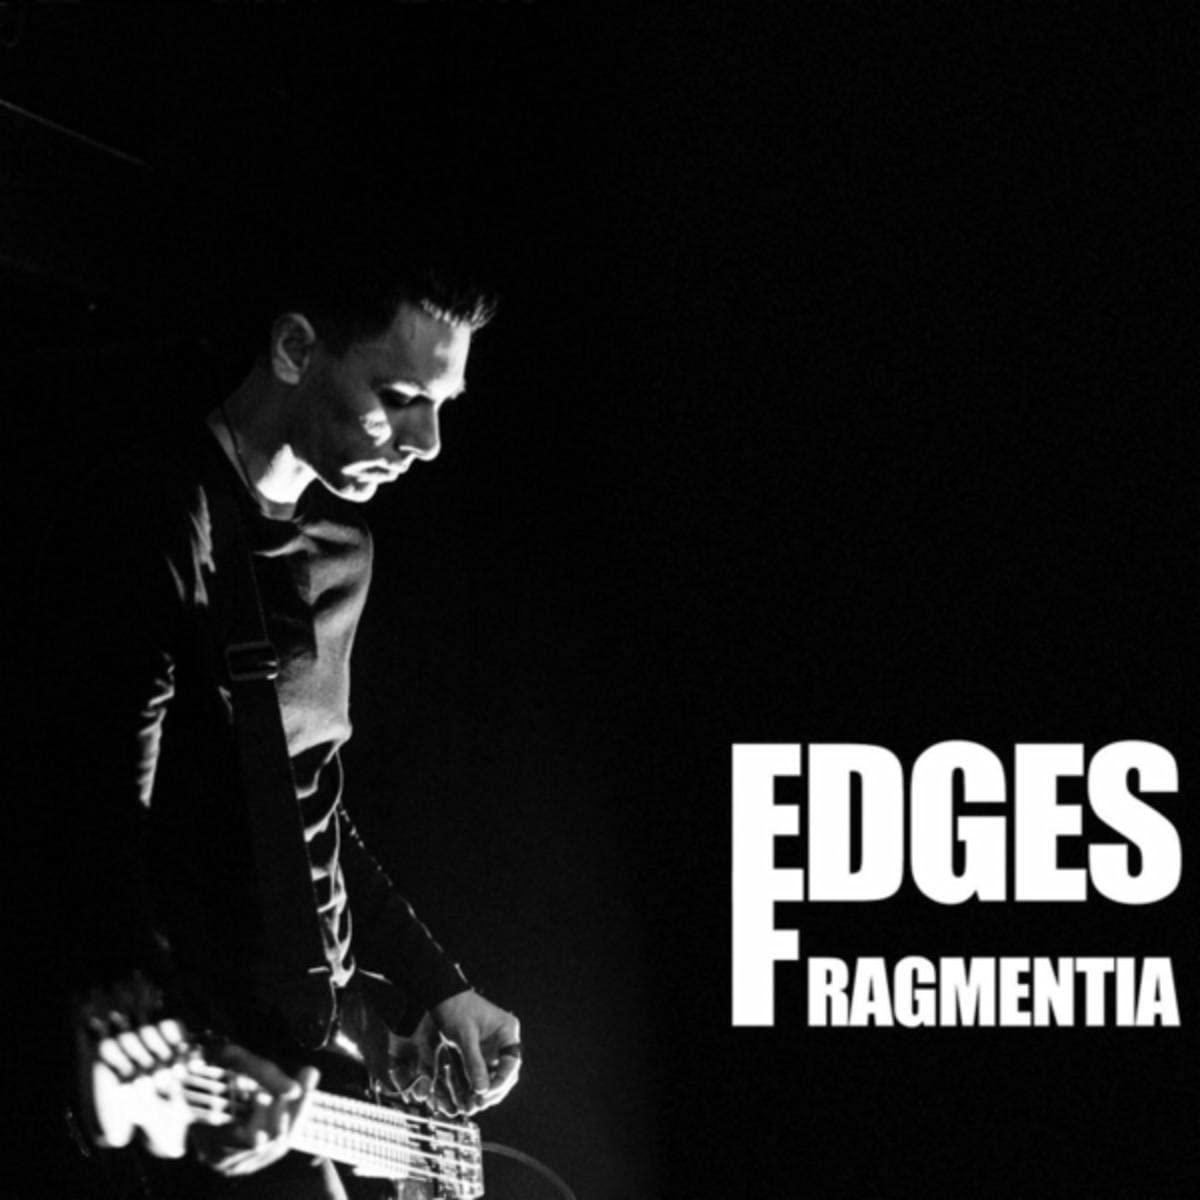 EDGES - Fragmentia (2021) [FLAC] Download